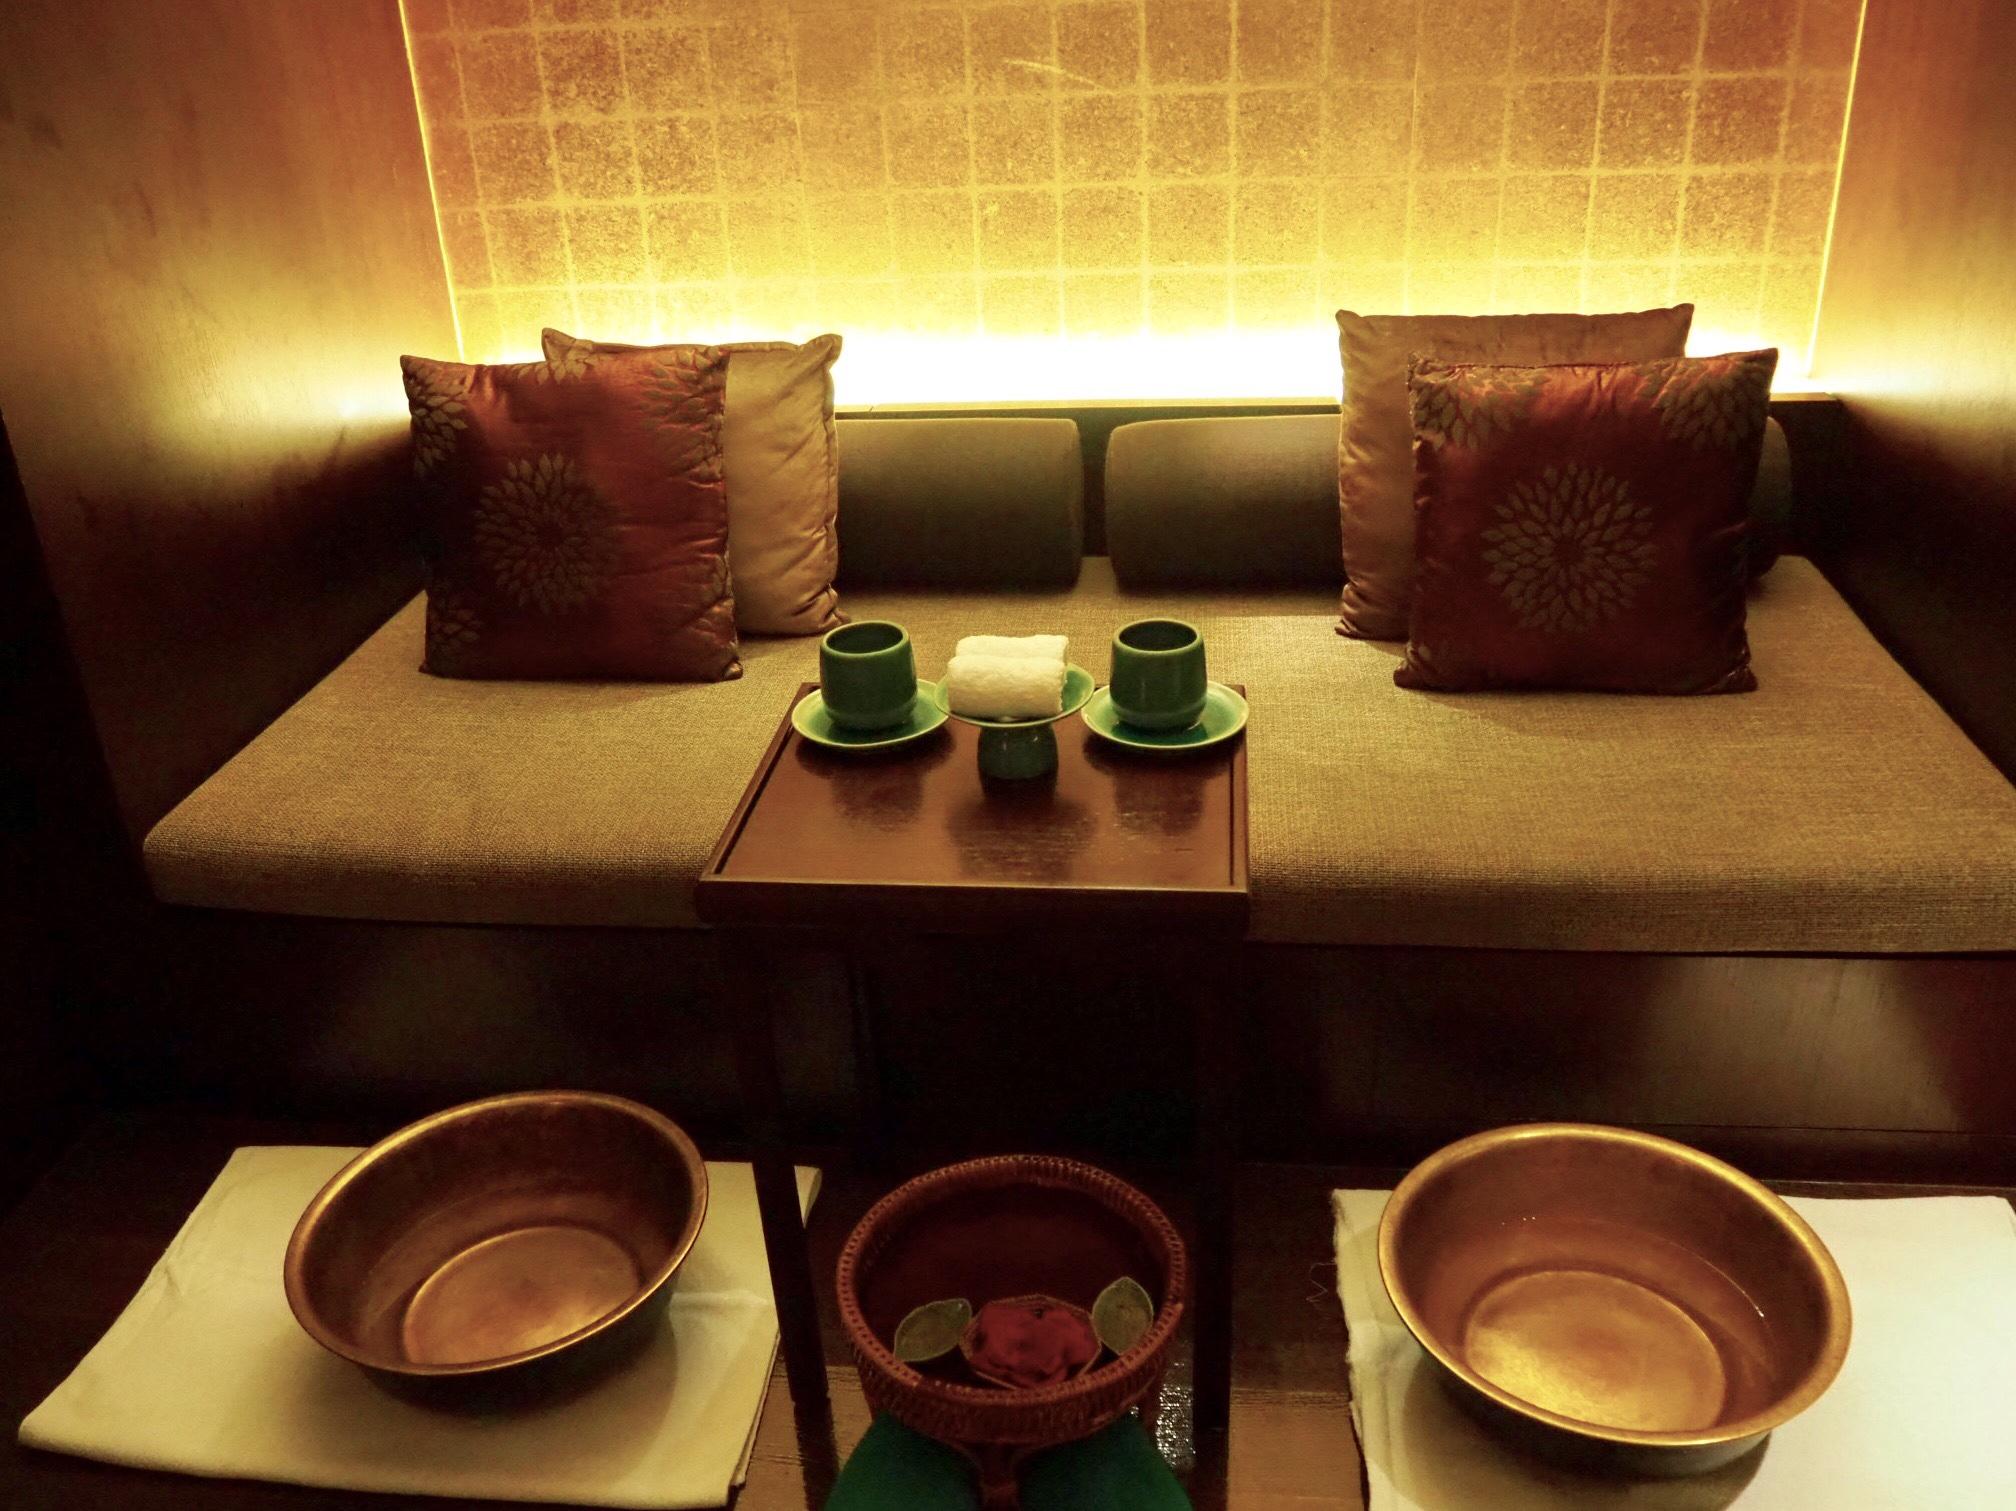 img 8070 - Banyan Tree Club & Spa Seoul - リピーターにお勧めしたい韓国ソウルのちょっと贅沢なステイ先